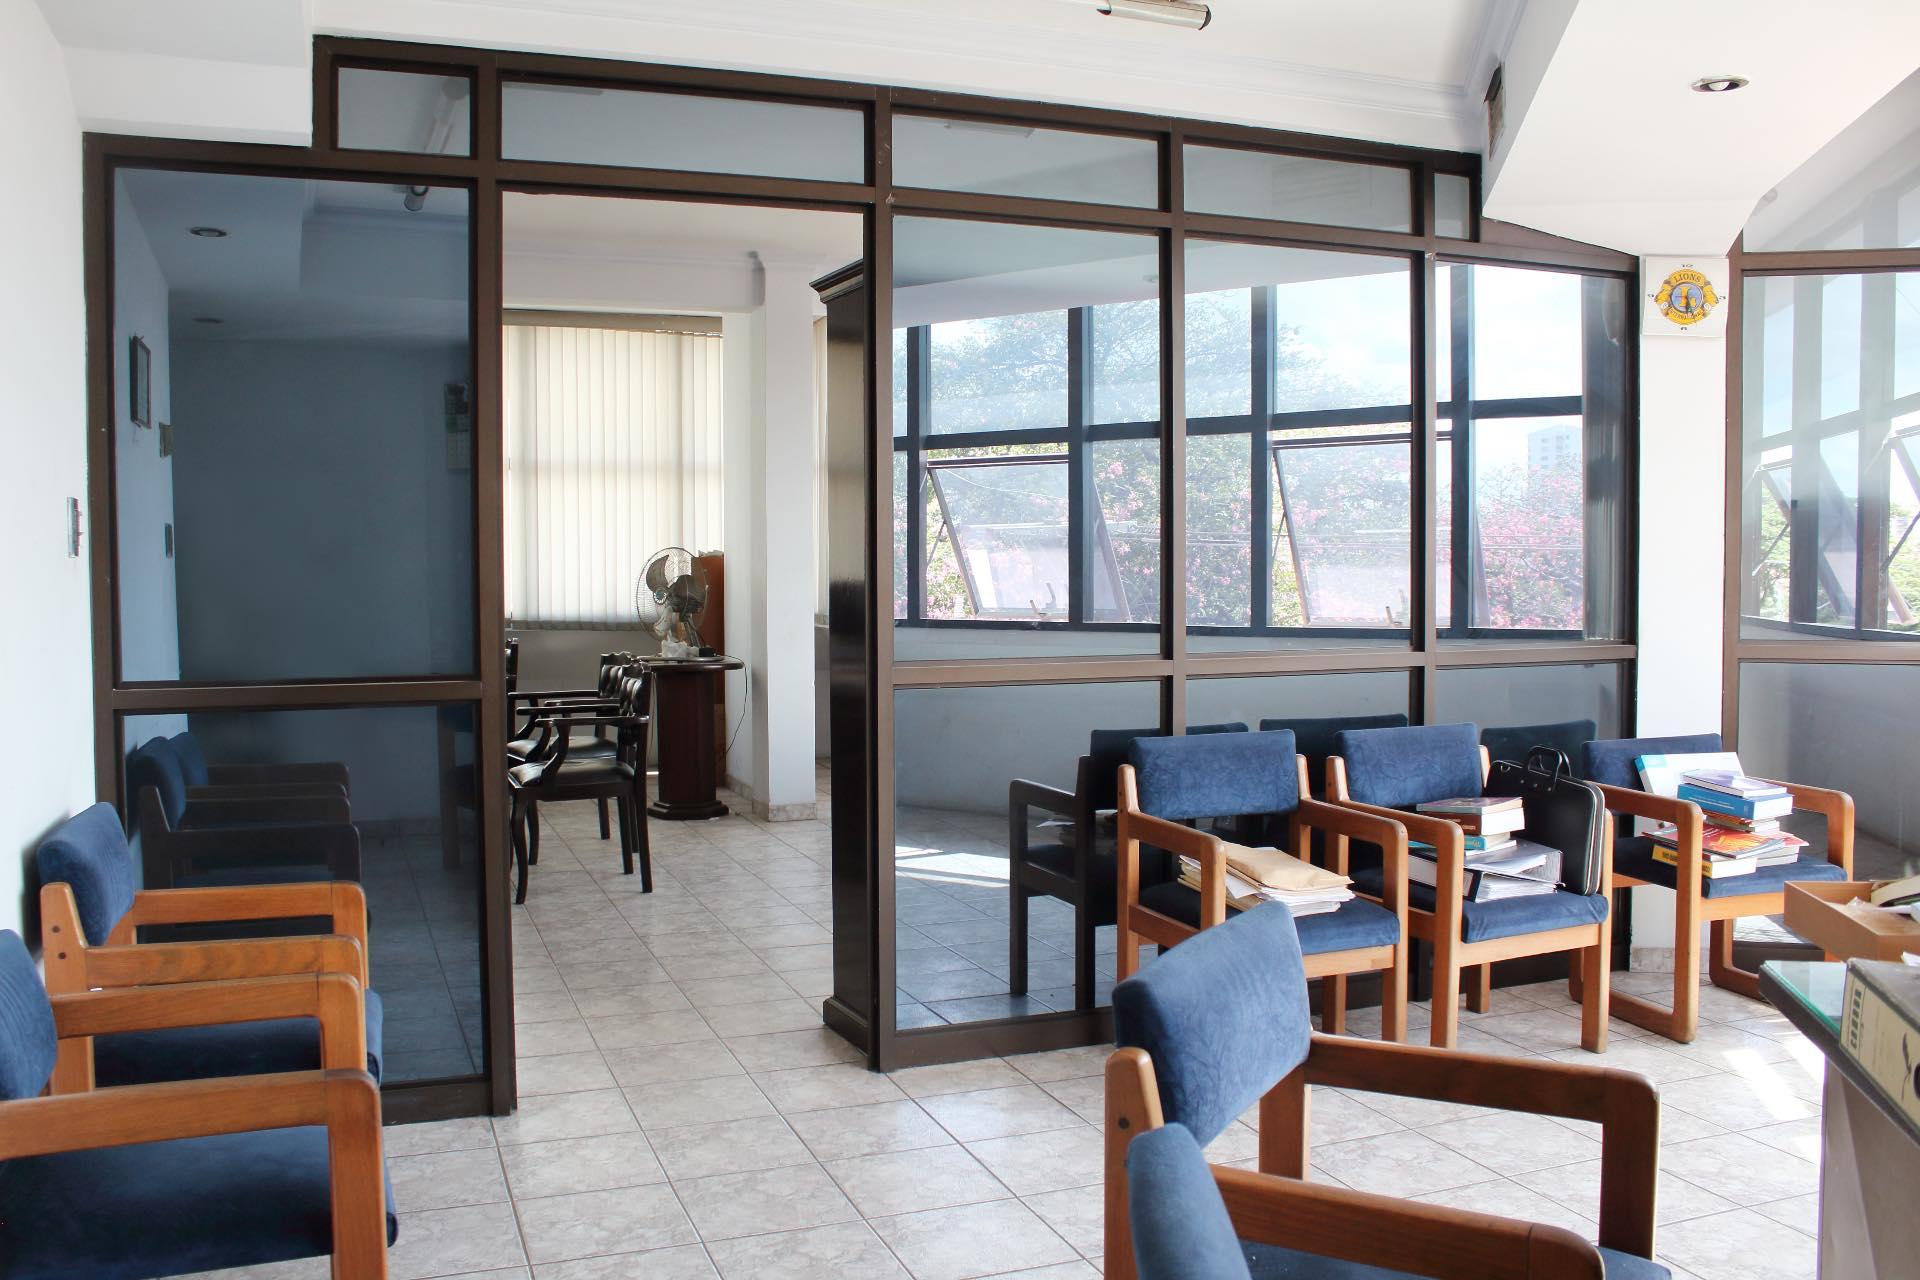 Local comercial en Venta Primer Anillo - AVENIDA URUGUAY Foto 3